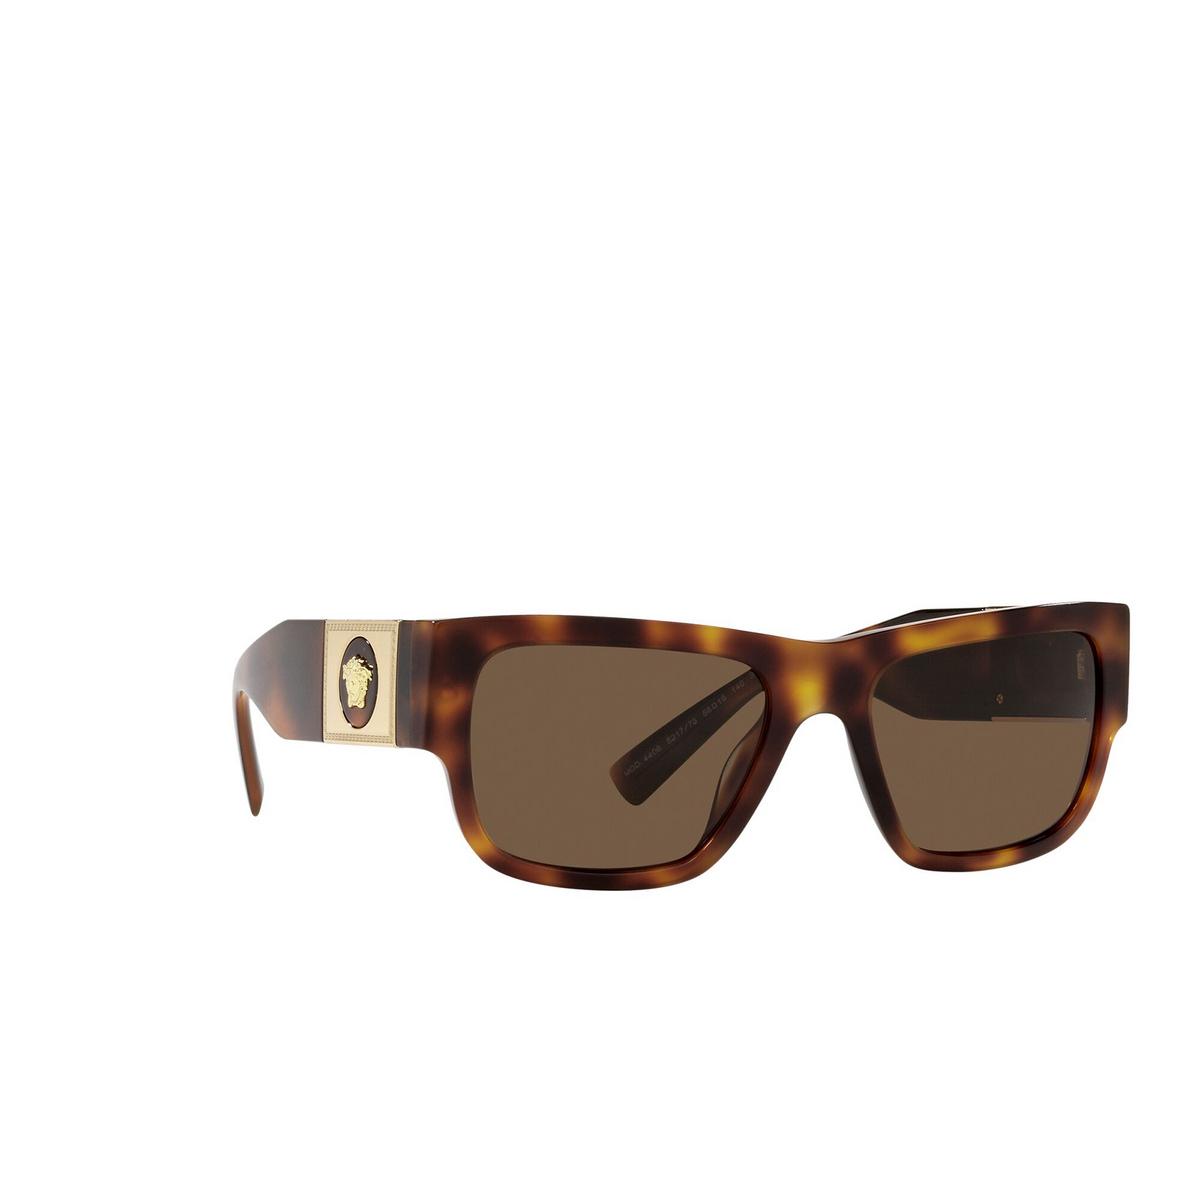 Versace® Rectangle Sunglasses: VE4406 color Havana 521773 - three-quarters view.